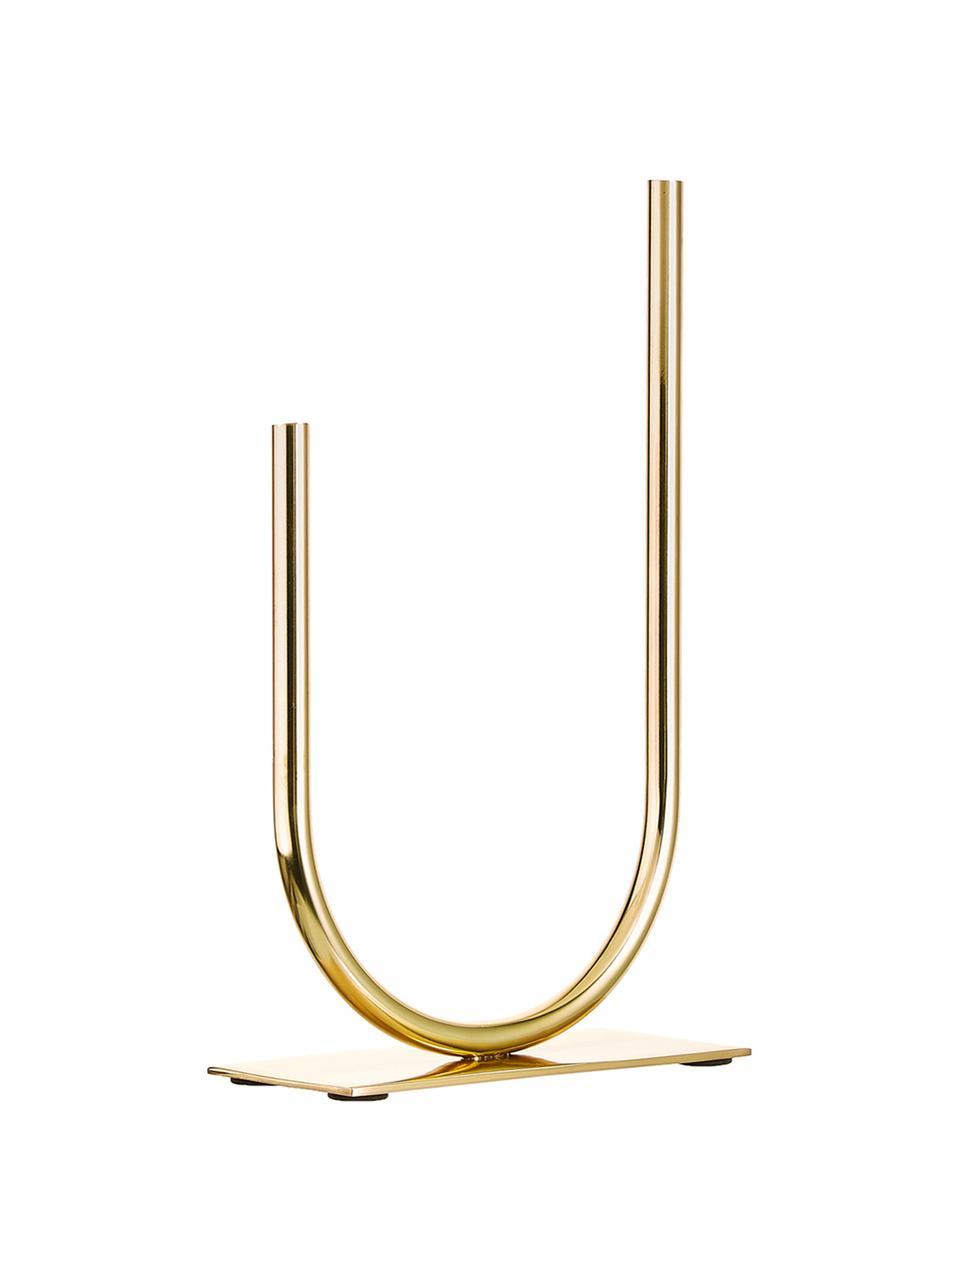 Decoratief object Circle U, Metaal, Goudkleurig, 19 x 30 cm